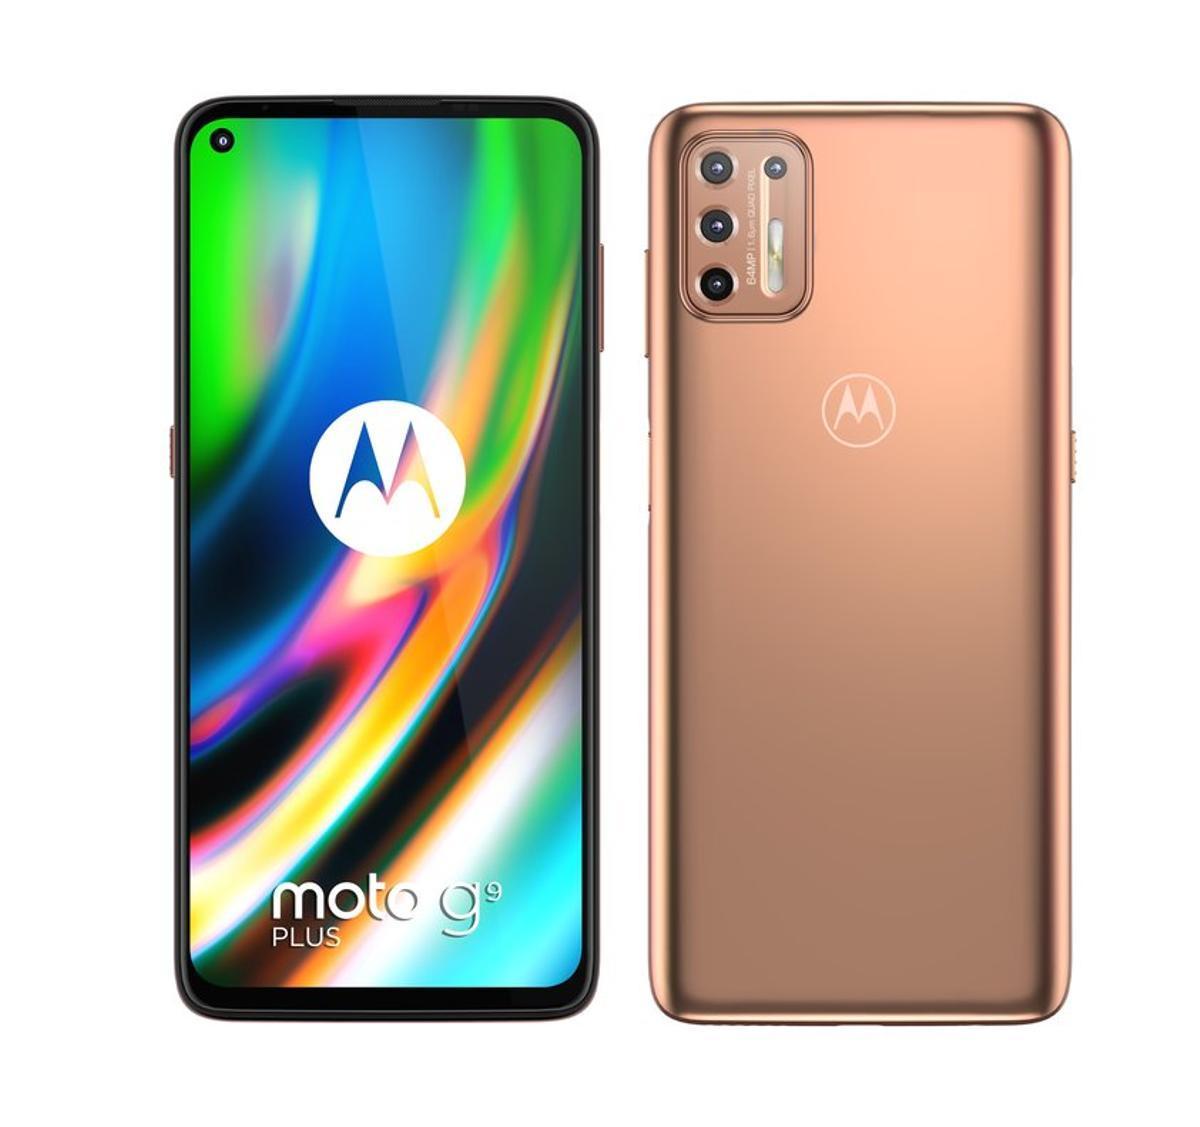 Motorola llança els moto g9 plus i moto e7 plus